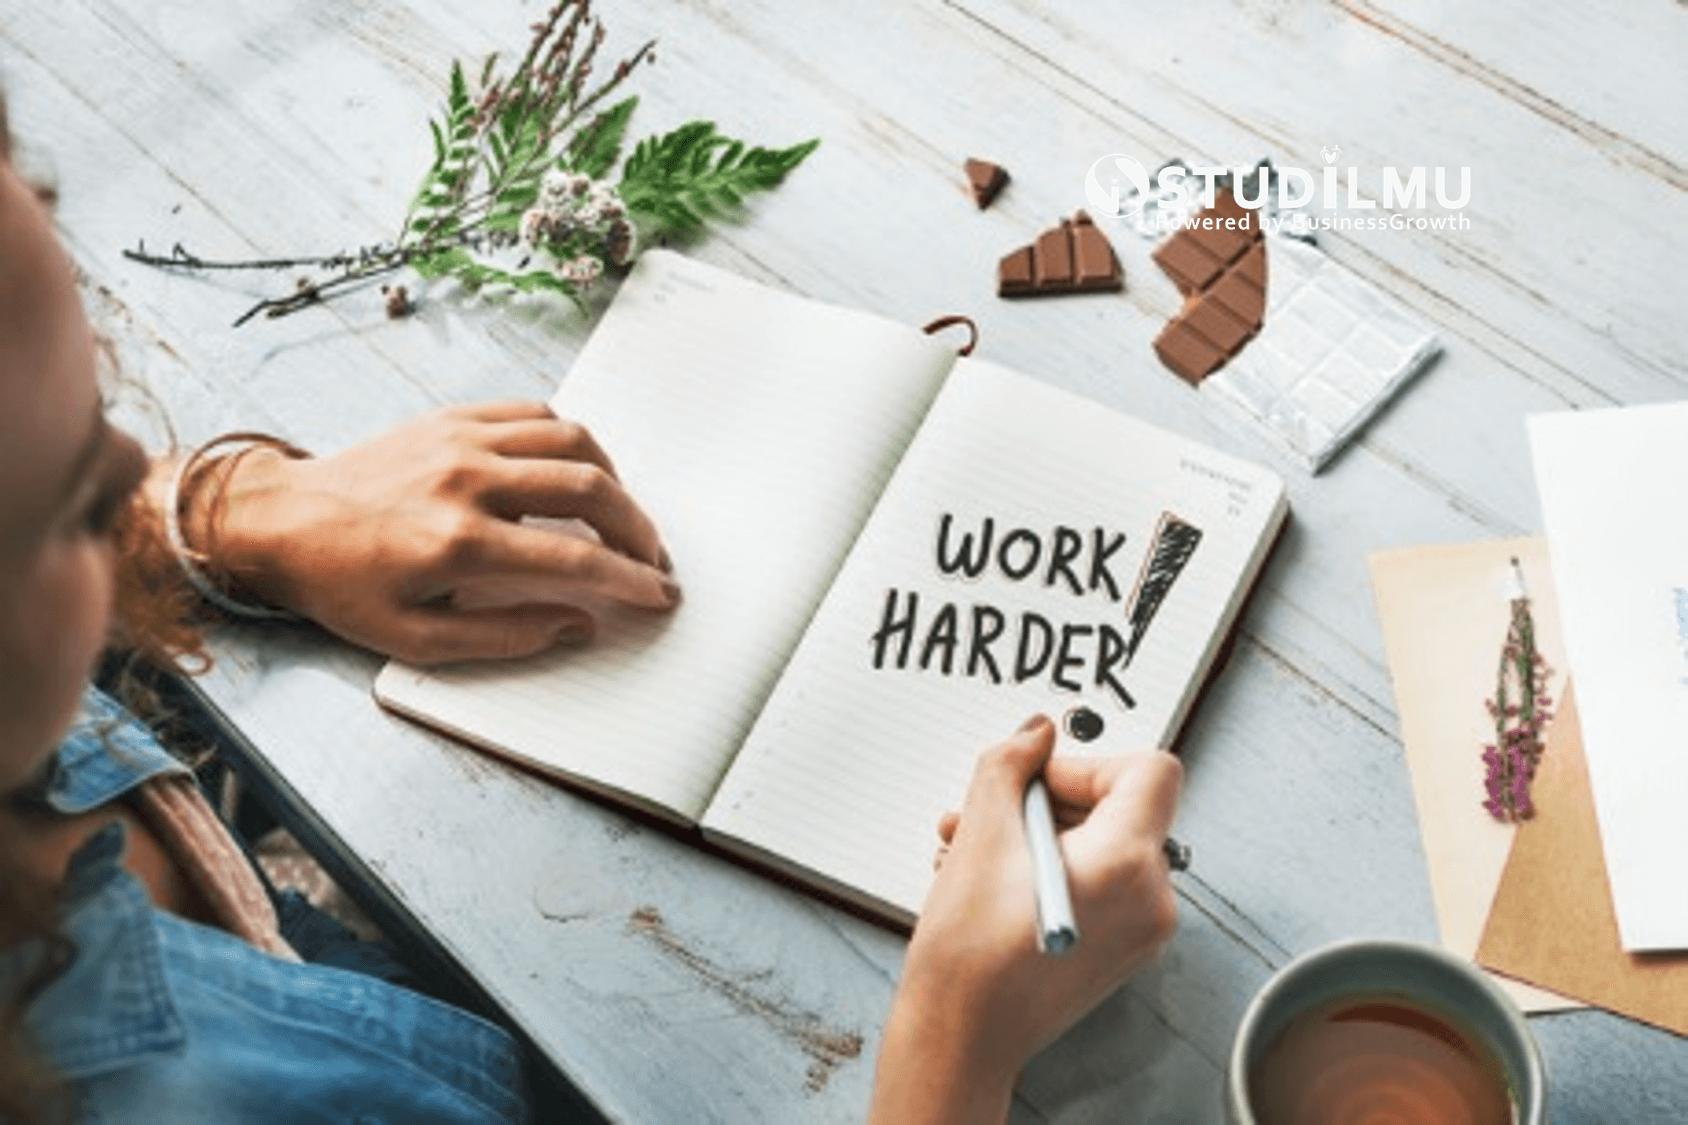 STUDILMU Career Advice - Pola Pikir Hebat Vs Pola Pikir Rata-rata